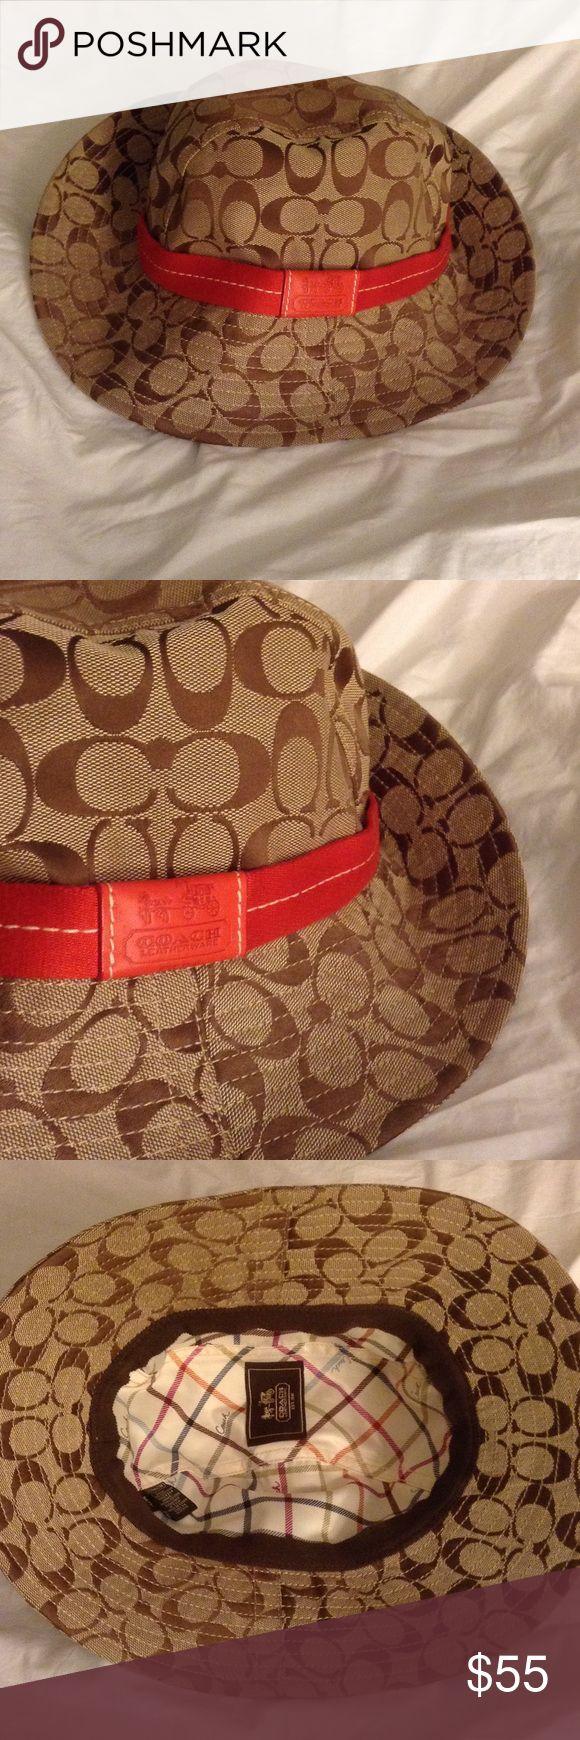 Coach hat Coach hat. Super cute. Great condition! Coach Accessories Hats